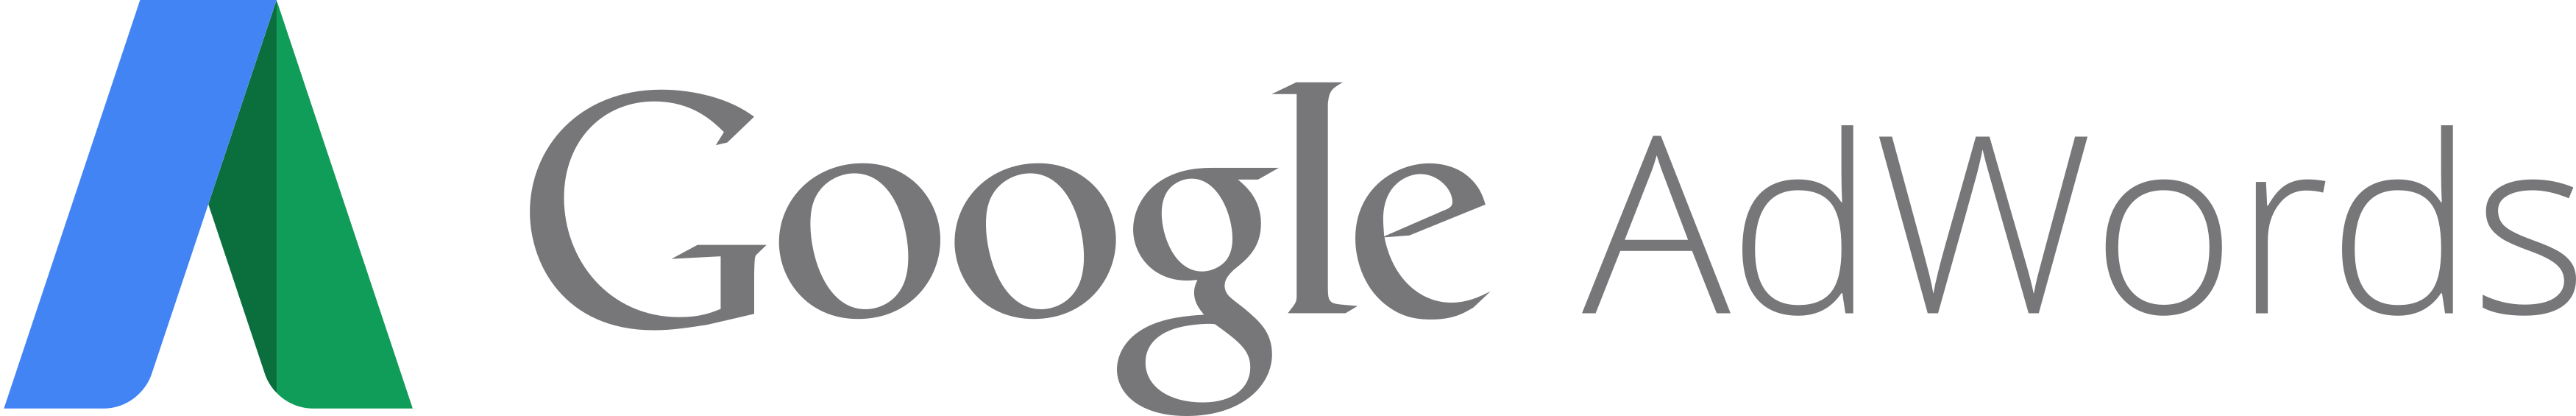 google adwords logo 1 - Google AdWords Logo